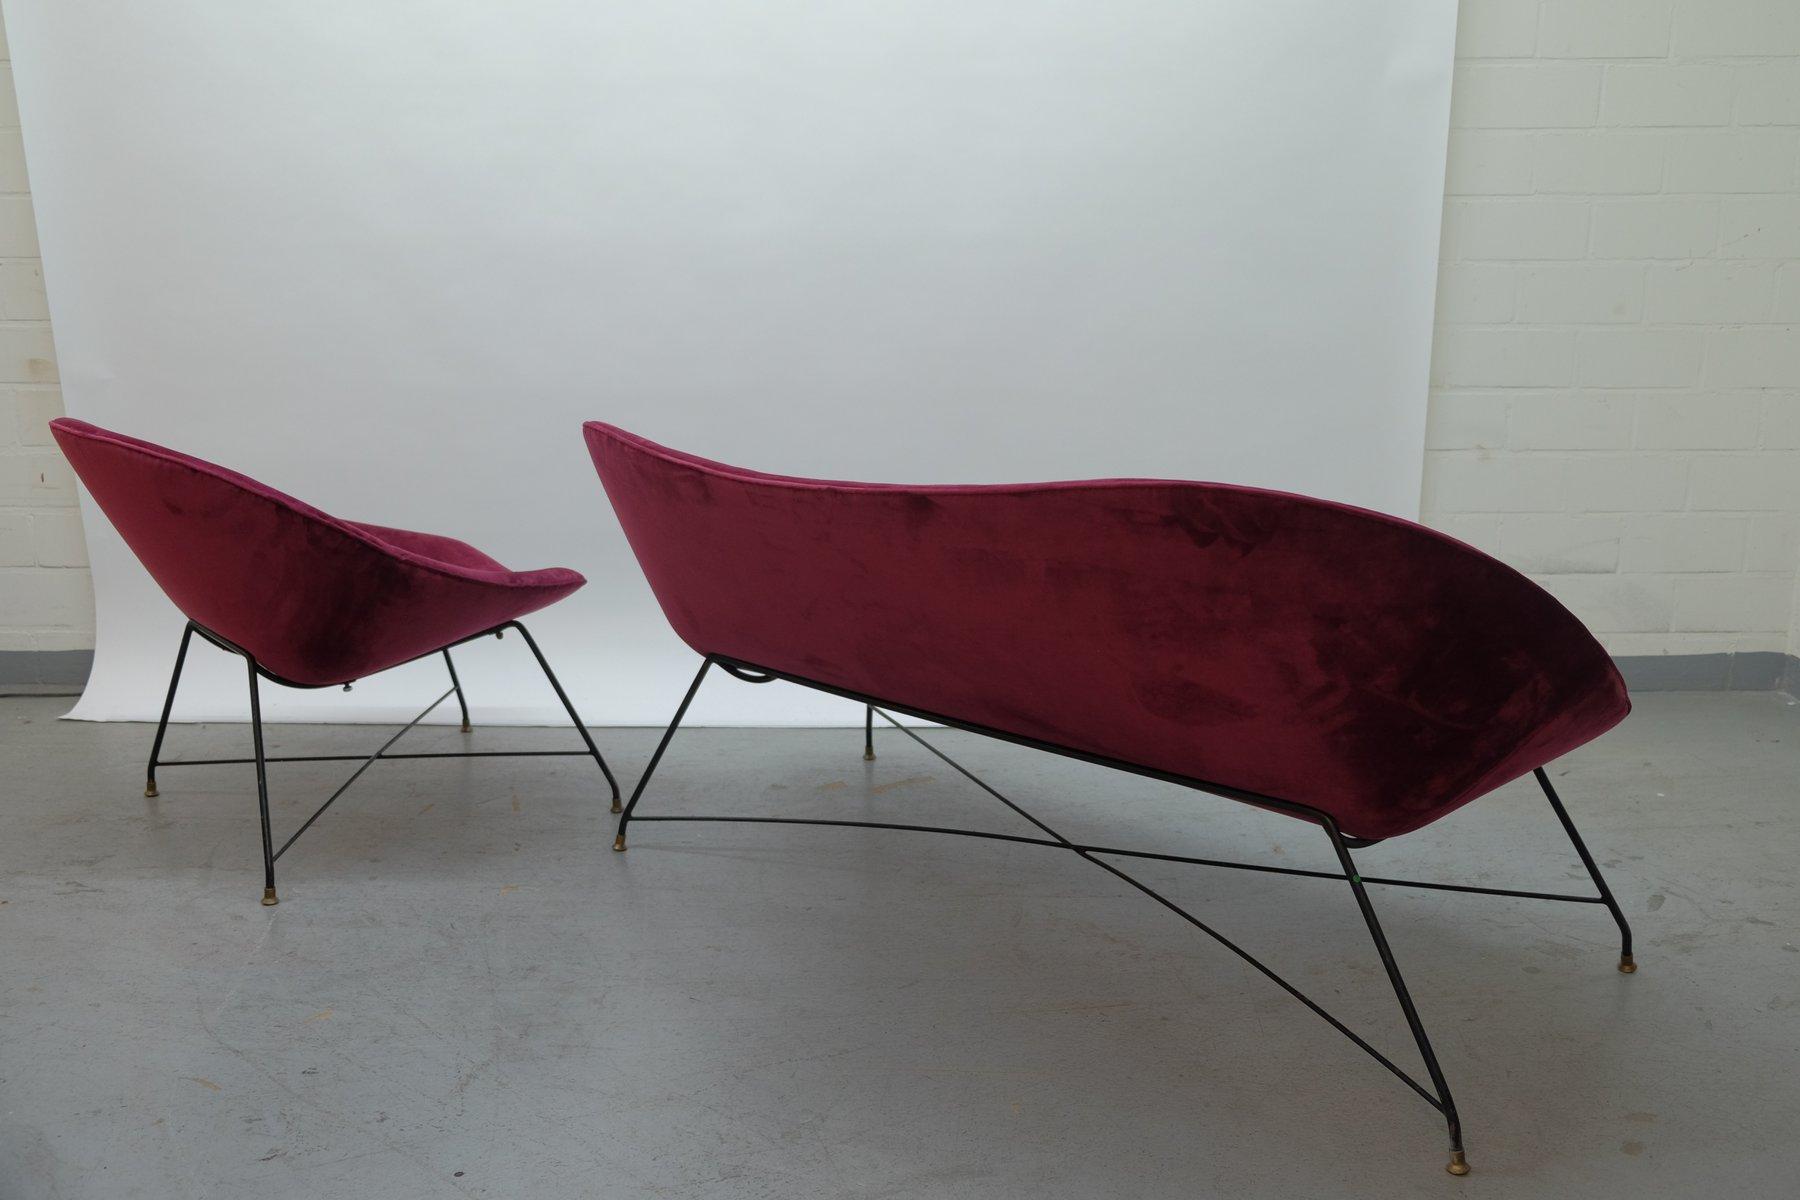 vintage sofa sessel von augusto bozzi f r saporiti italia bei pamono kaufen. Black Bedroom Furniture Sets. Home Design Ideas